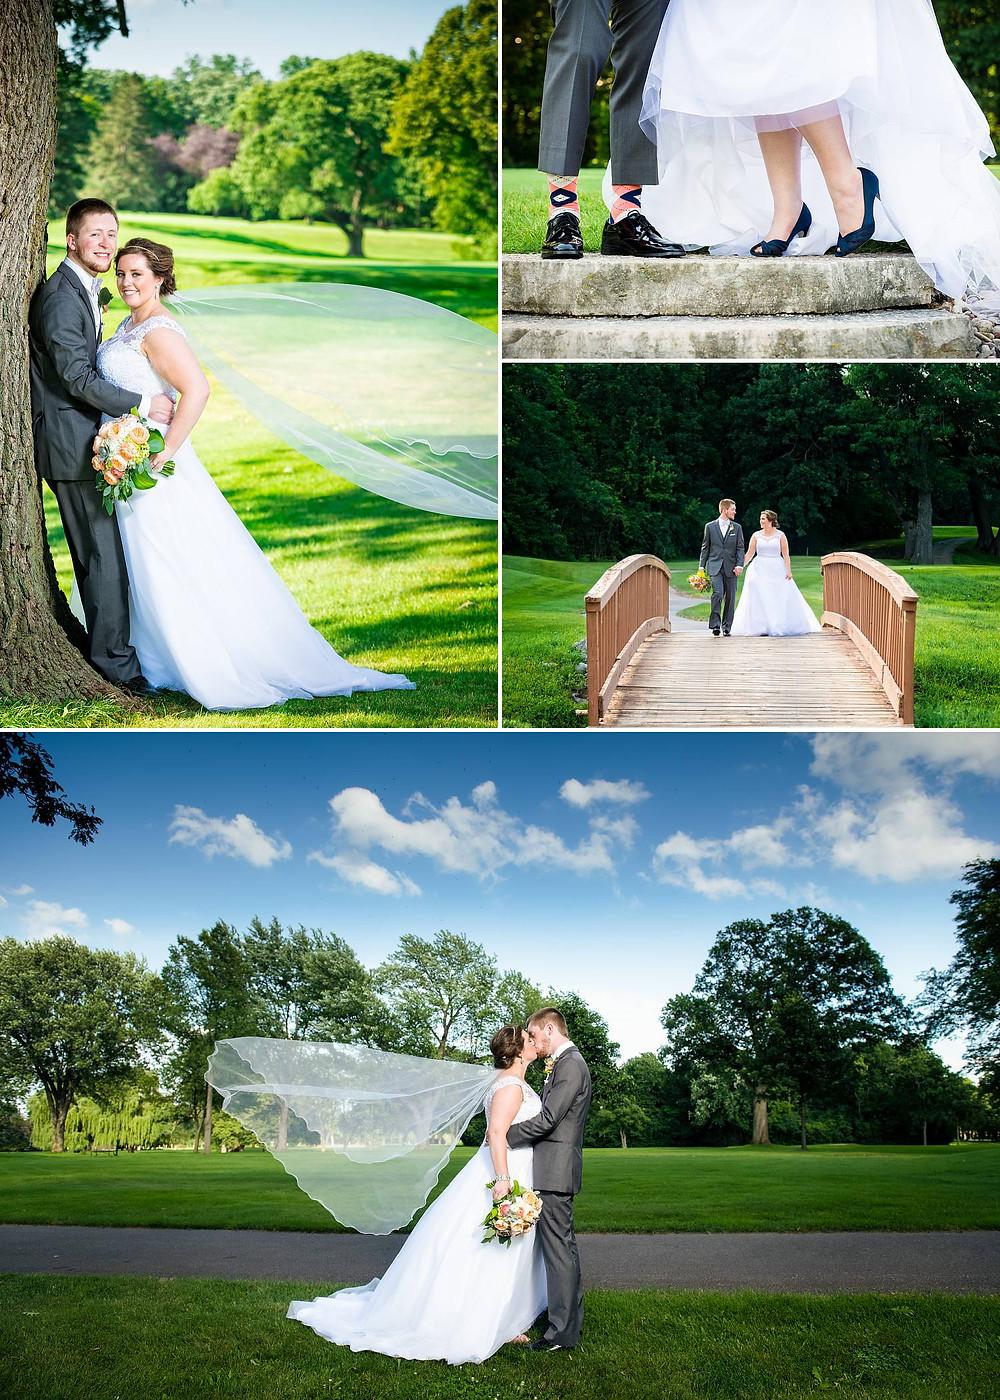 Oshkosh Wisconsin Bride Groom Wedding Portraits   Lanari Photography